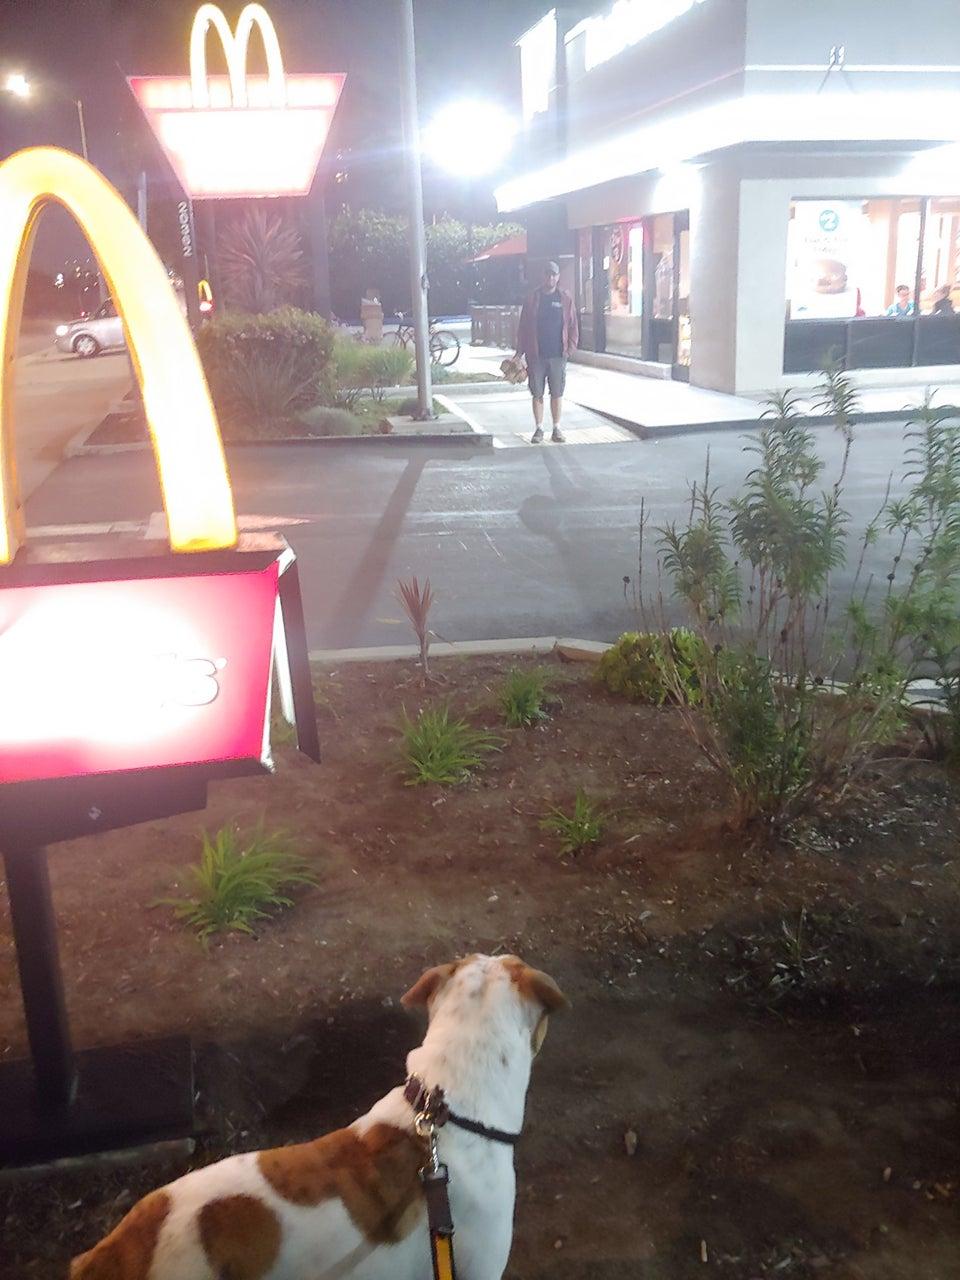 McDonald's Huntington Beach